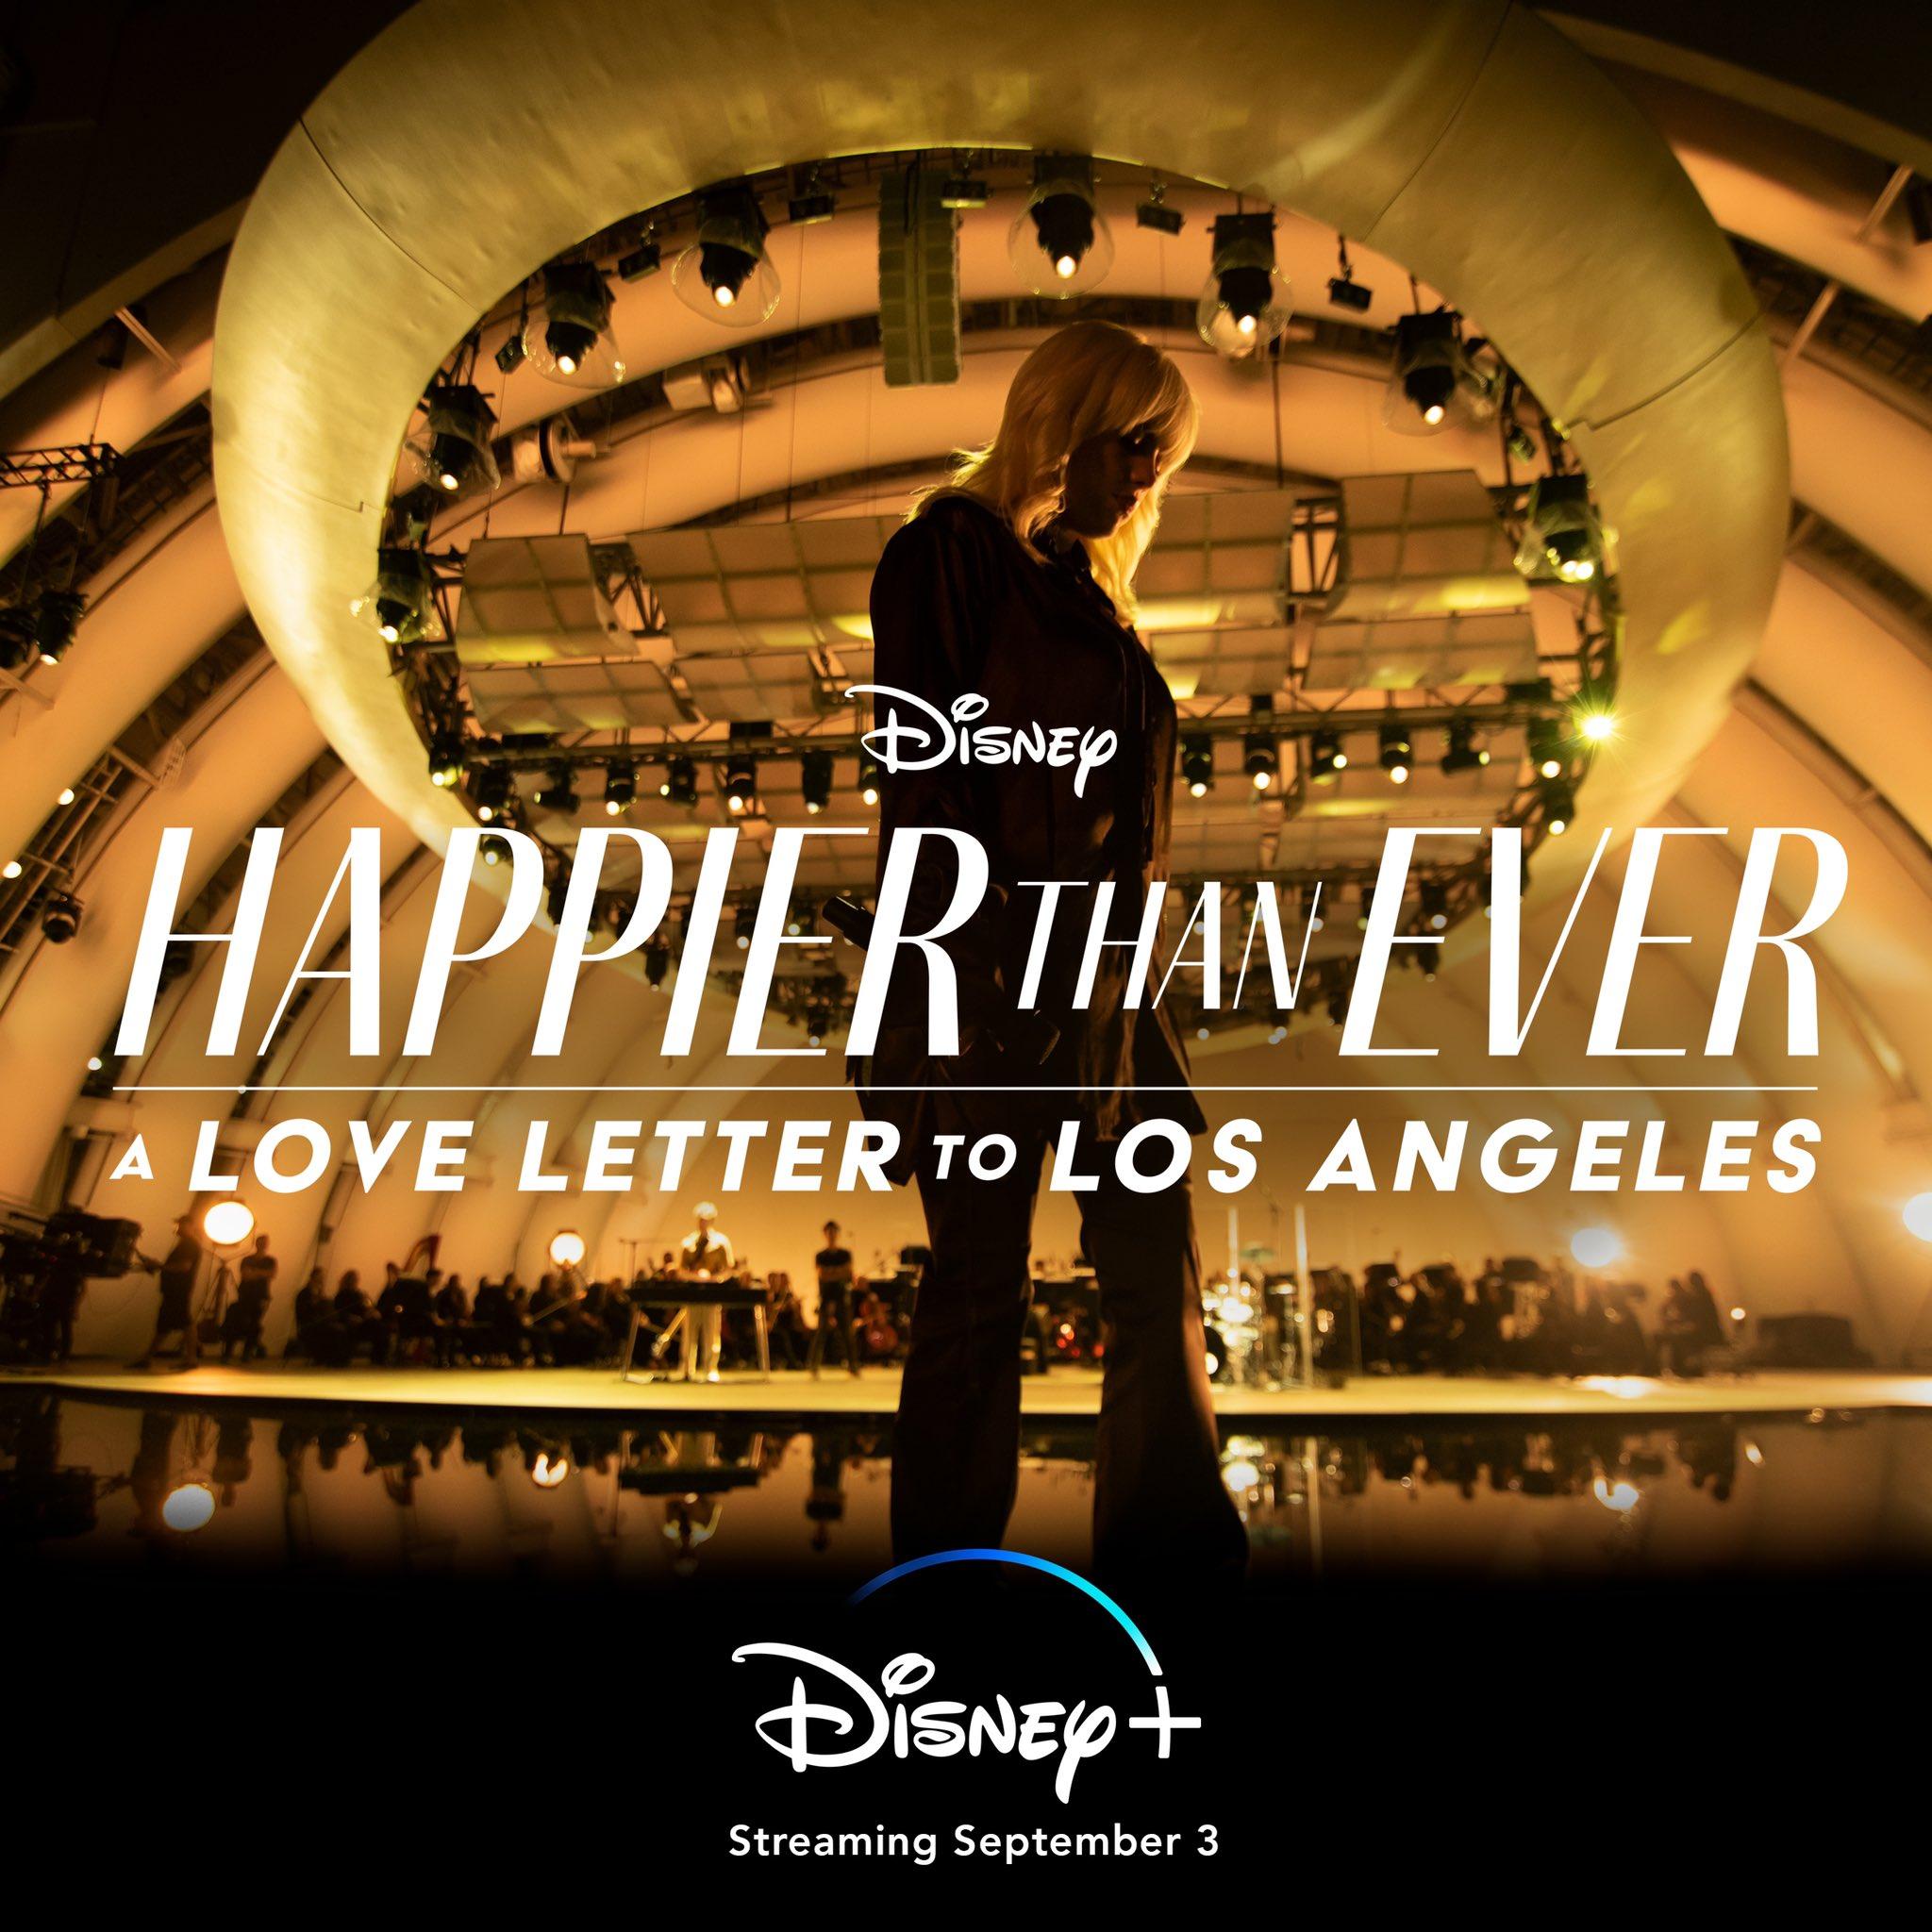 https://www.billieforum.com/media/happier_than_ever_a_love_letter_to_los_angeles-jpg.4755/full